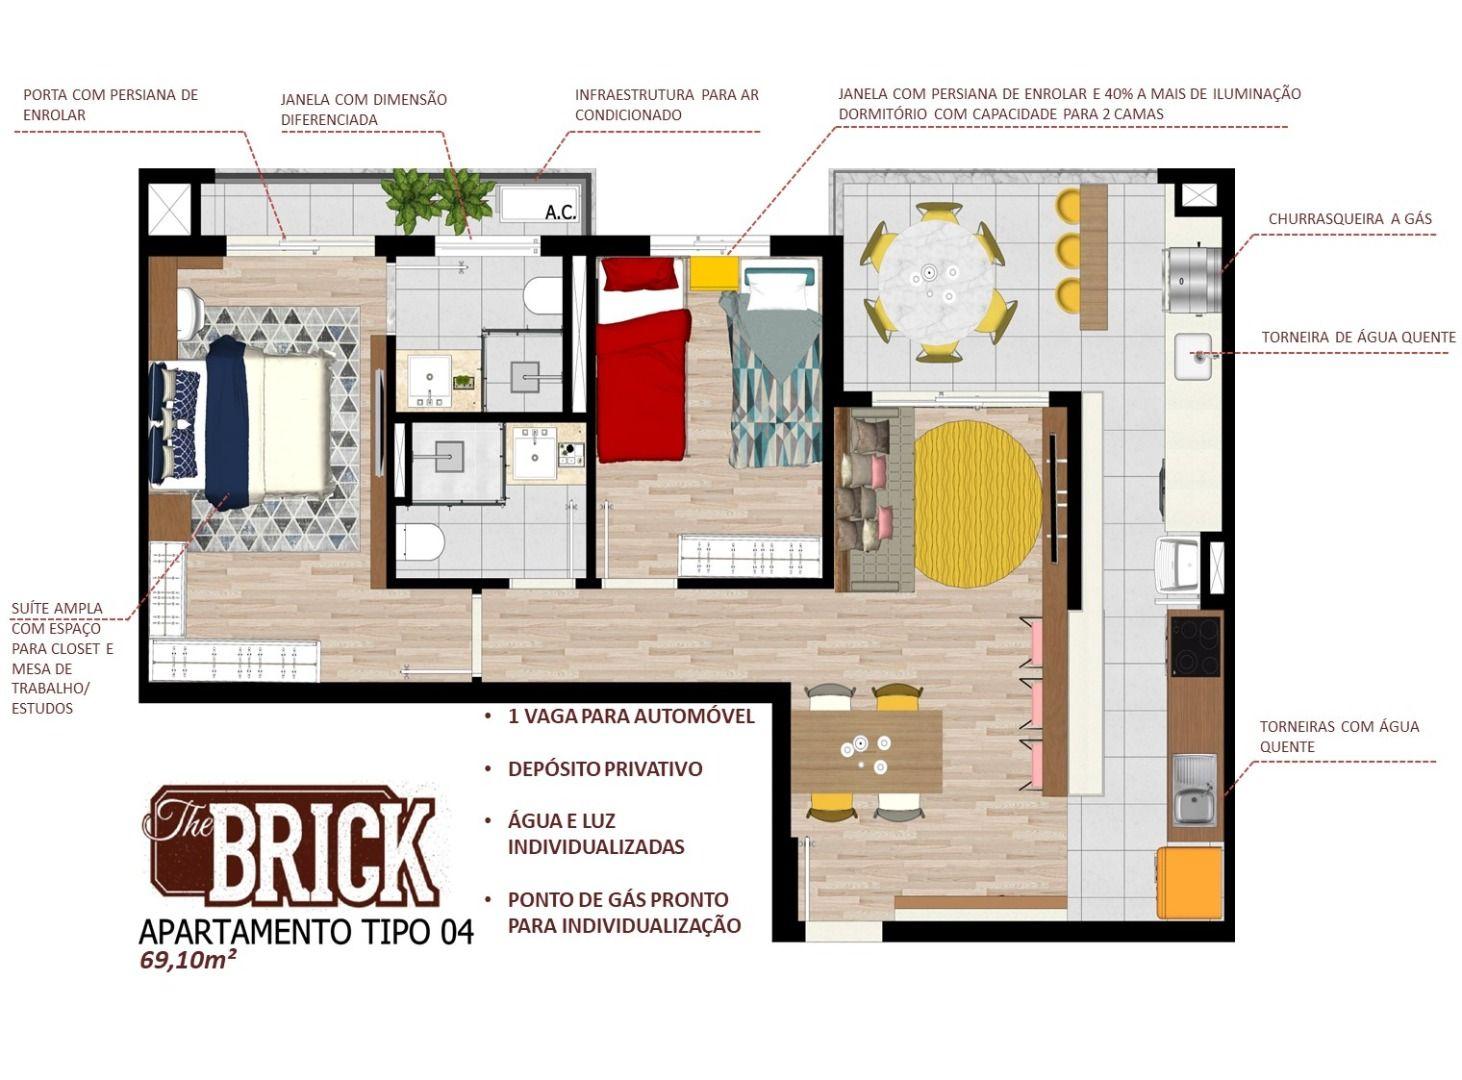 Planta do The Brick. floorplan